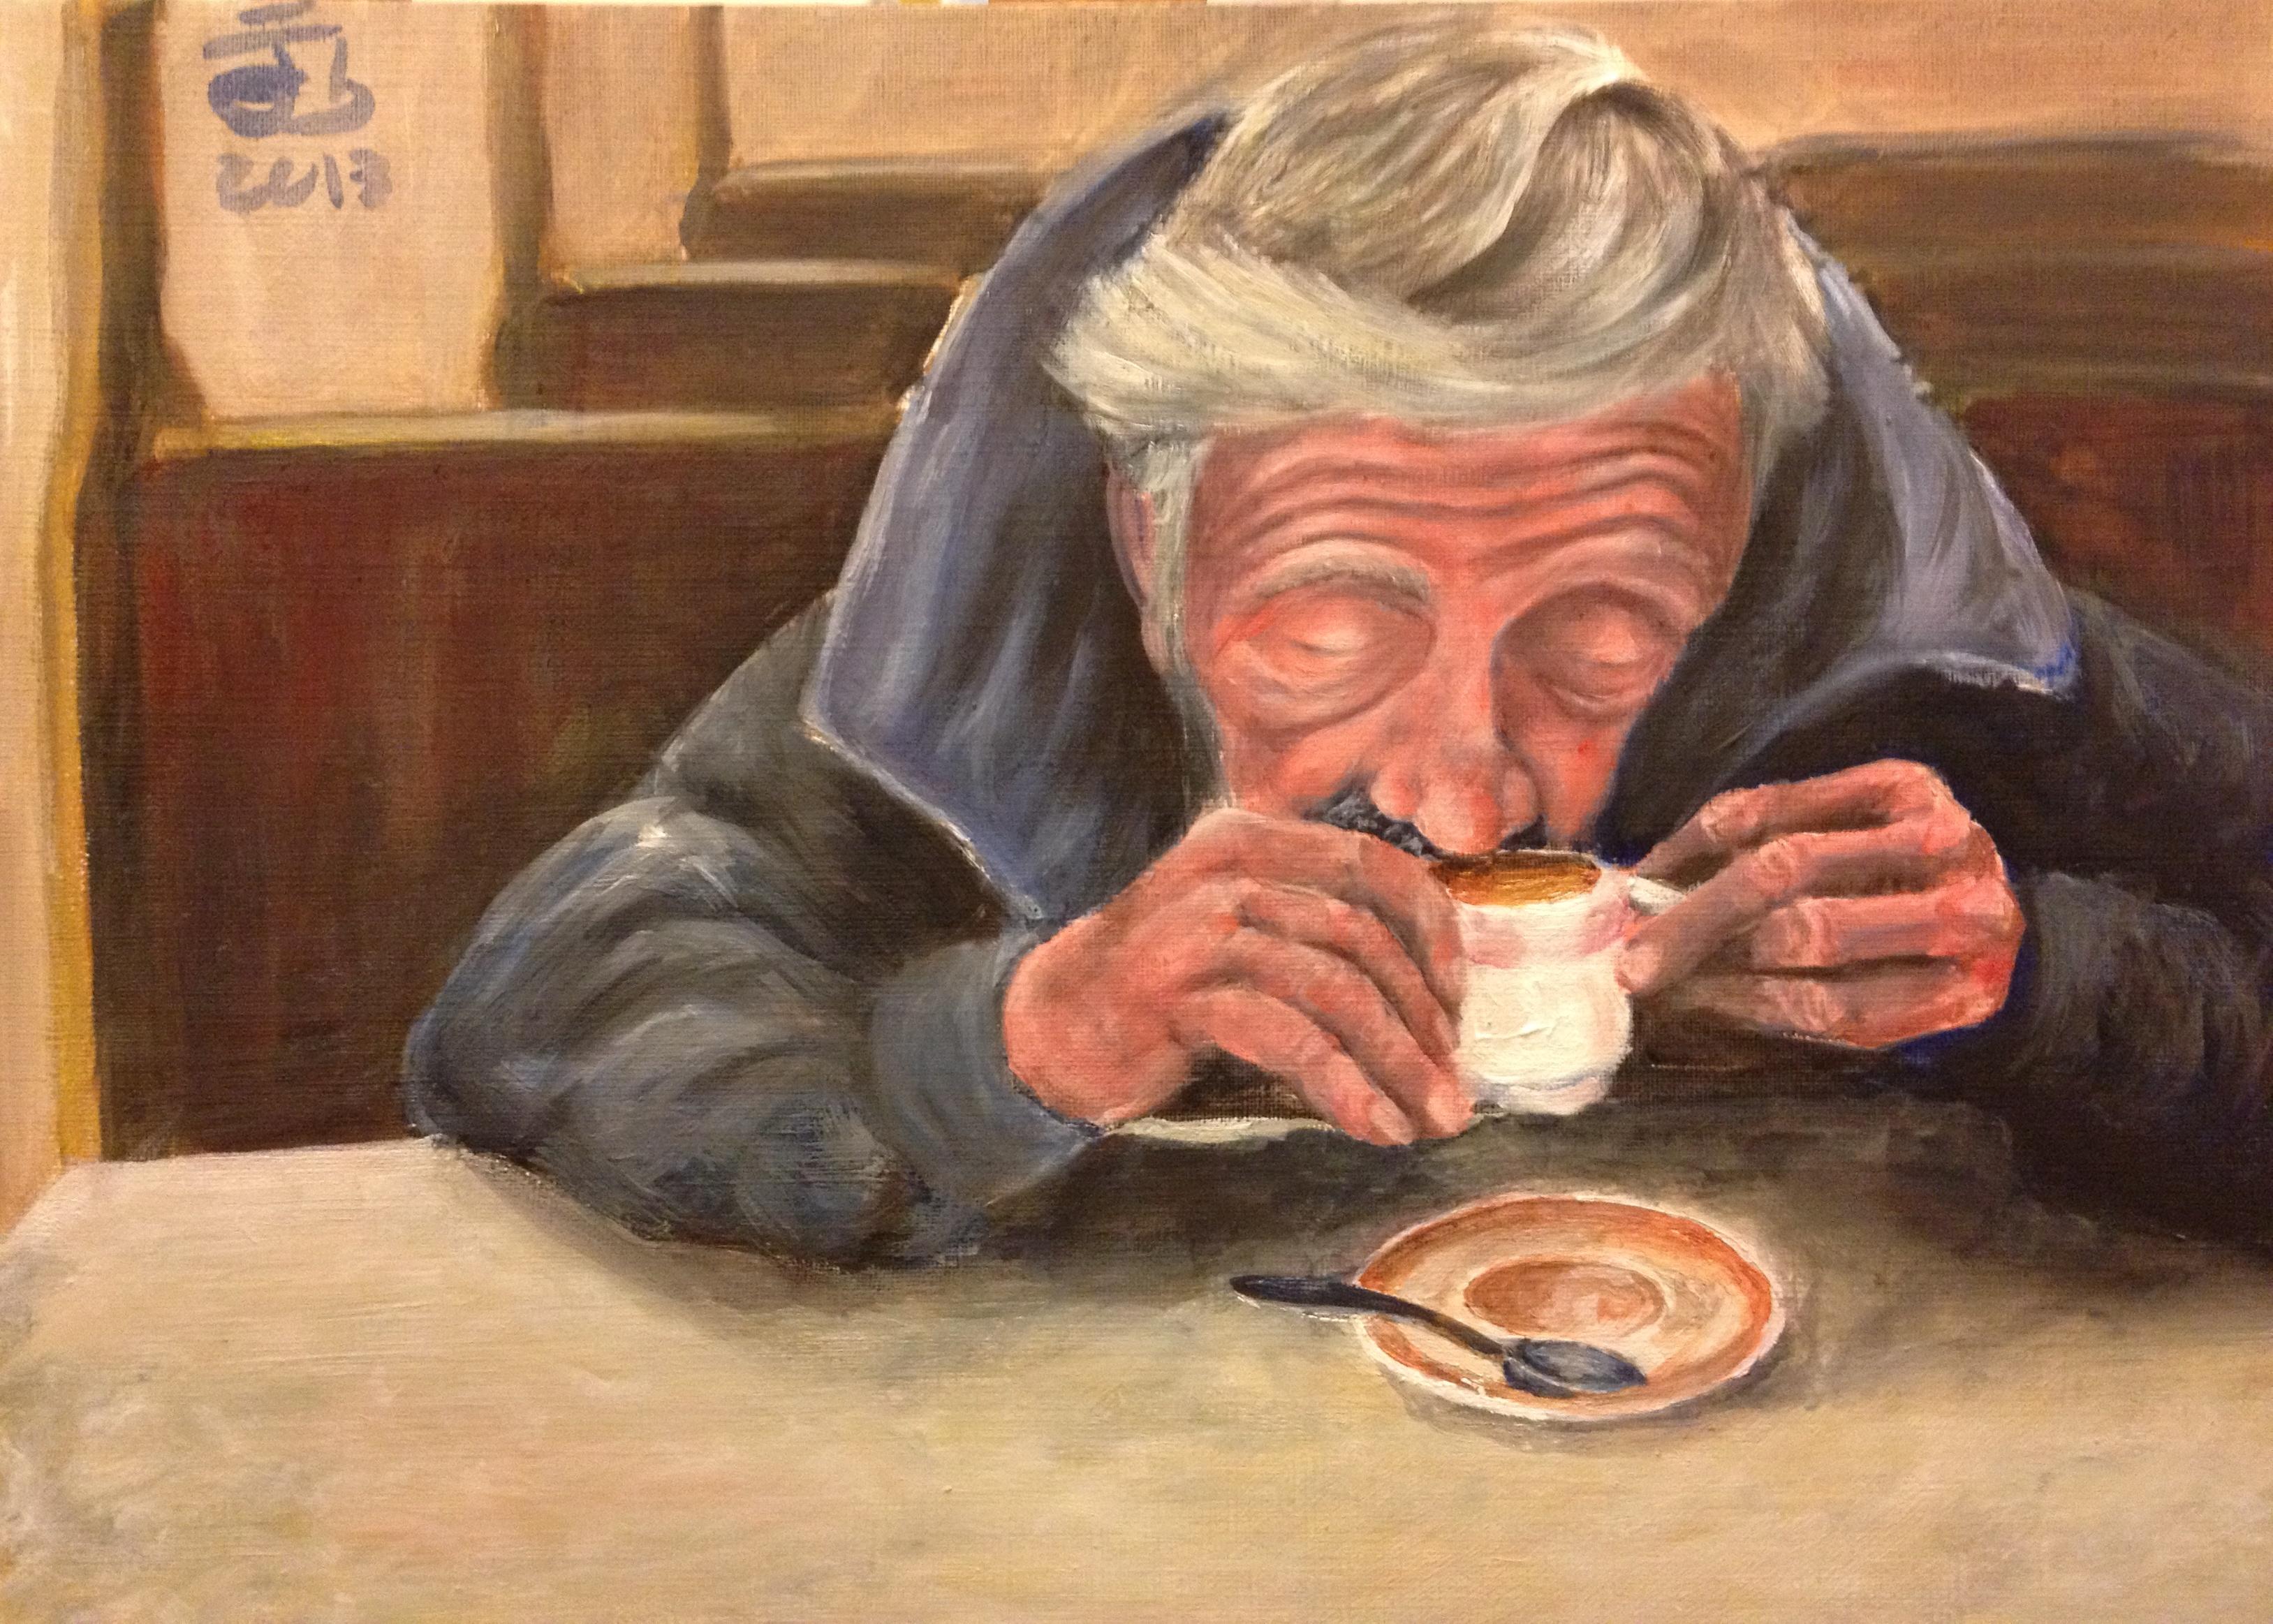 Hombre mayor tomando leche materna - 2 part 8